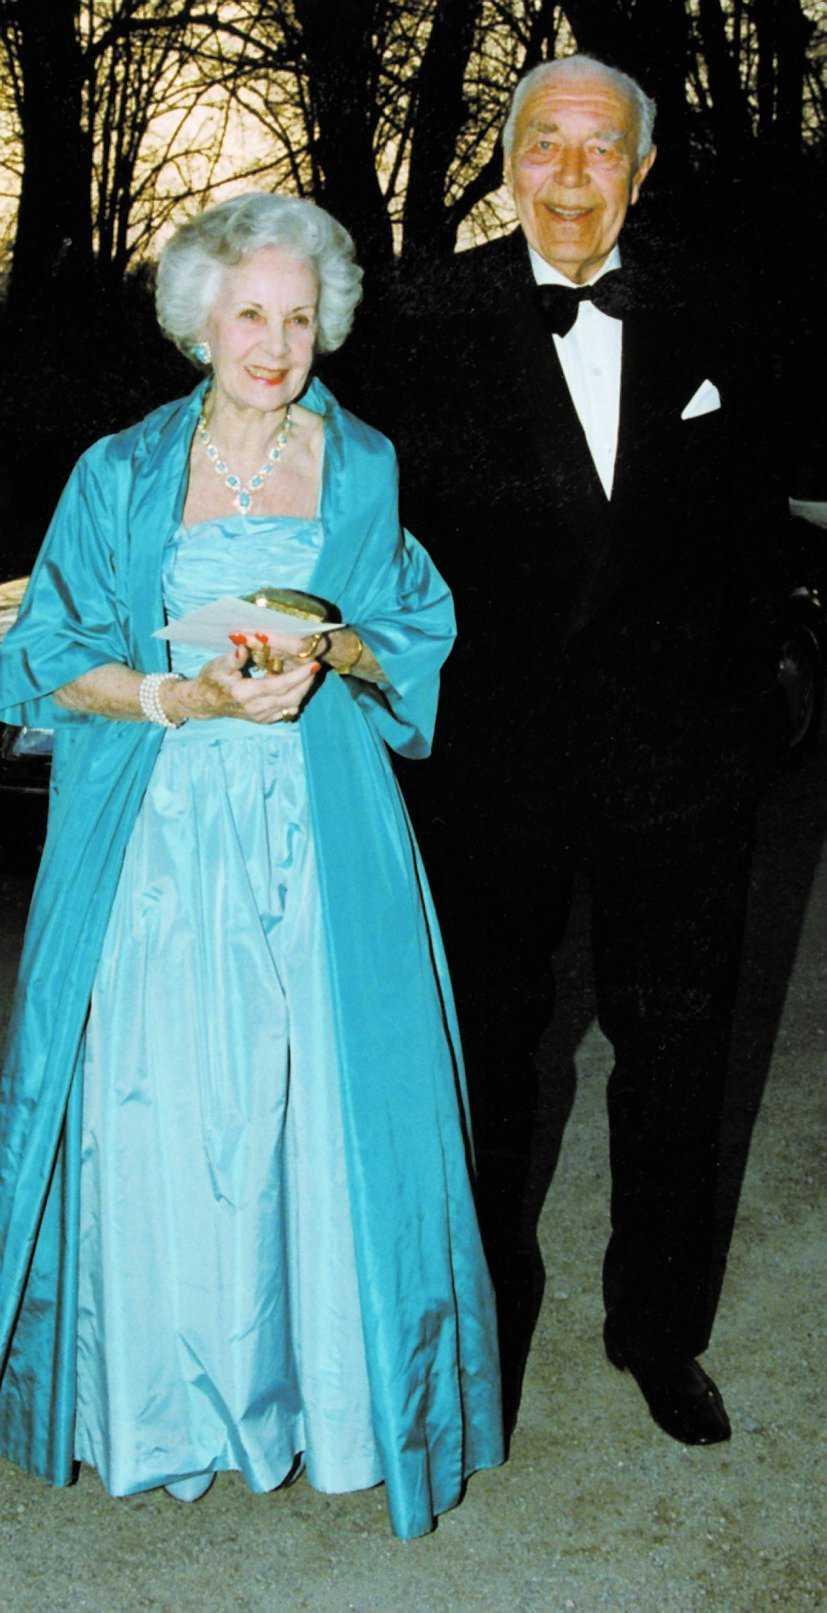 Prins Bertil med prinsessan Lilian. Hennes far var gruvarbetare.